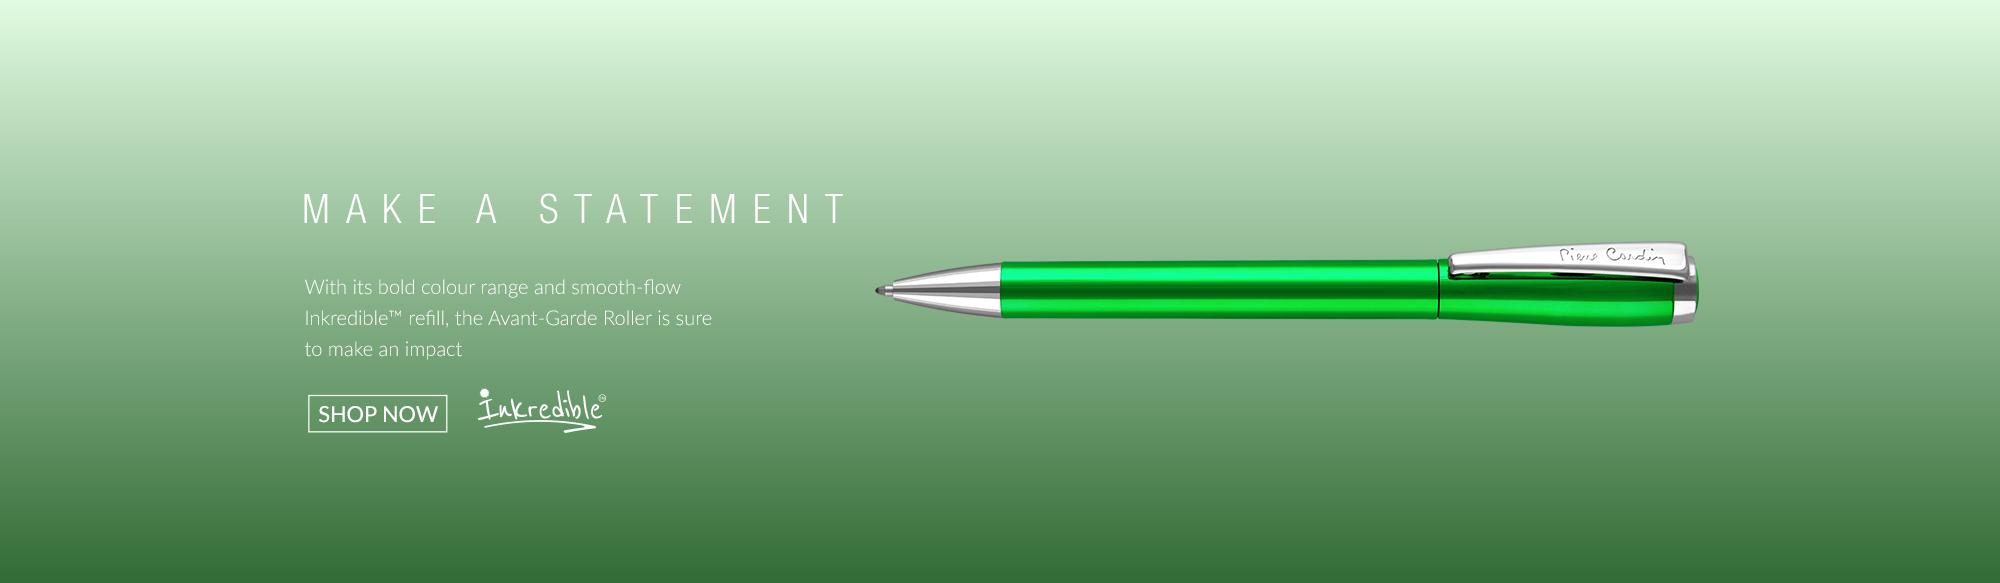 Designer rollerball-pens from Pierre Cardin